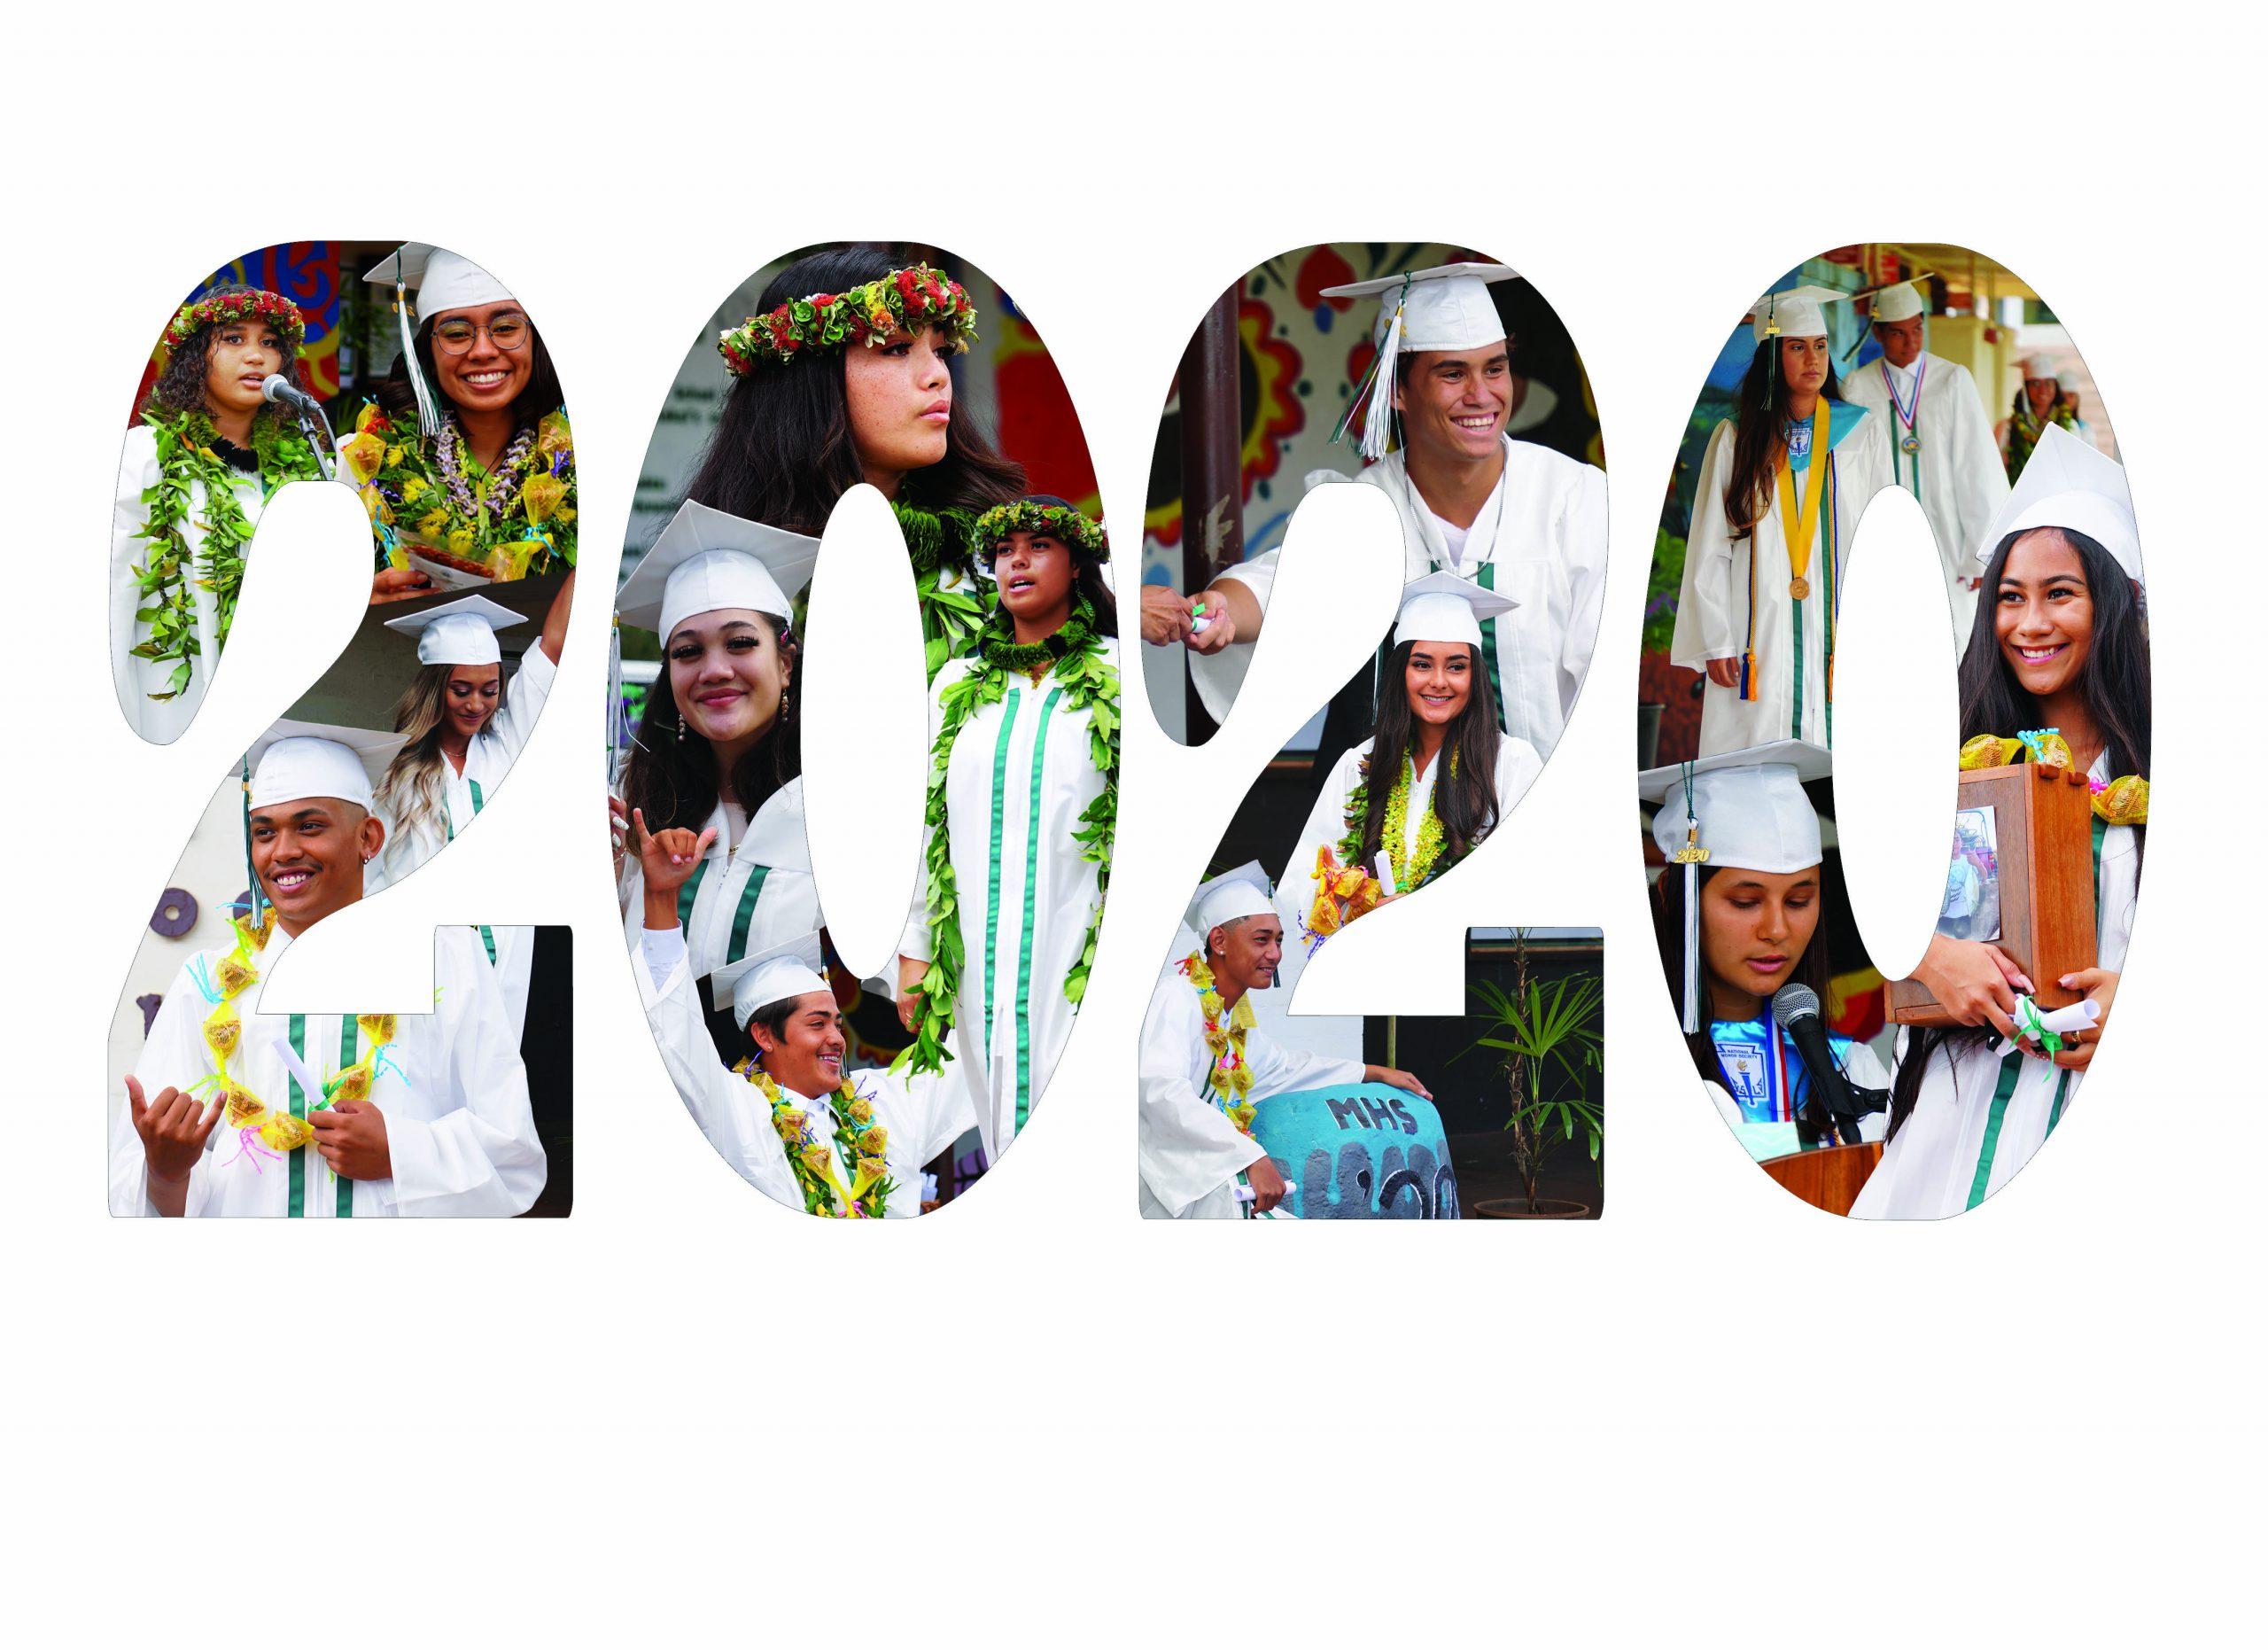 Class of 2020 Celebrates Unconventional Graduation